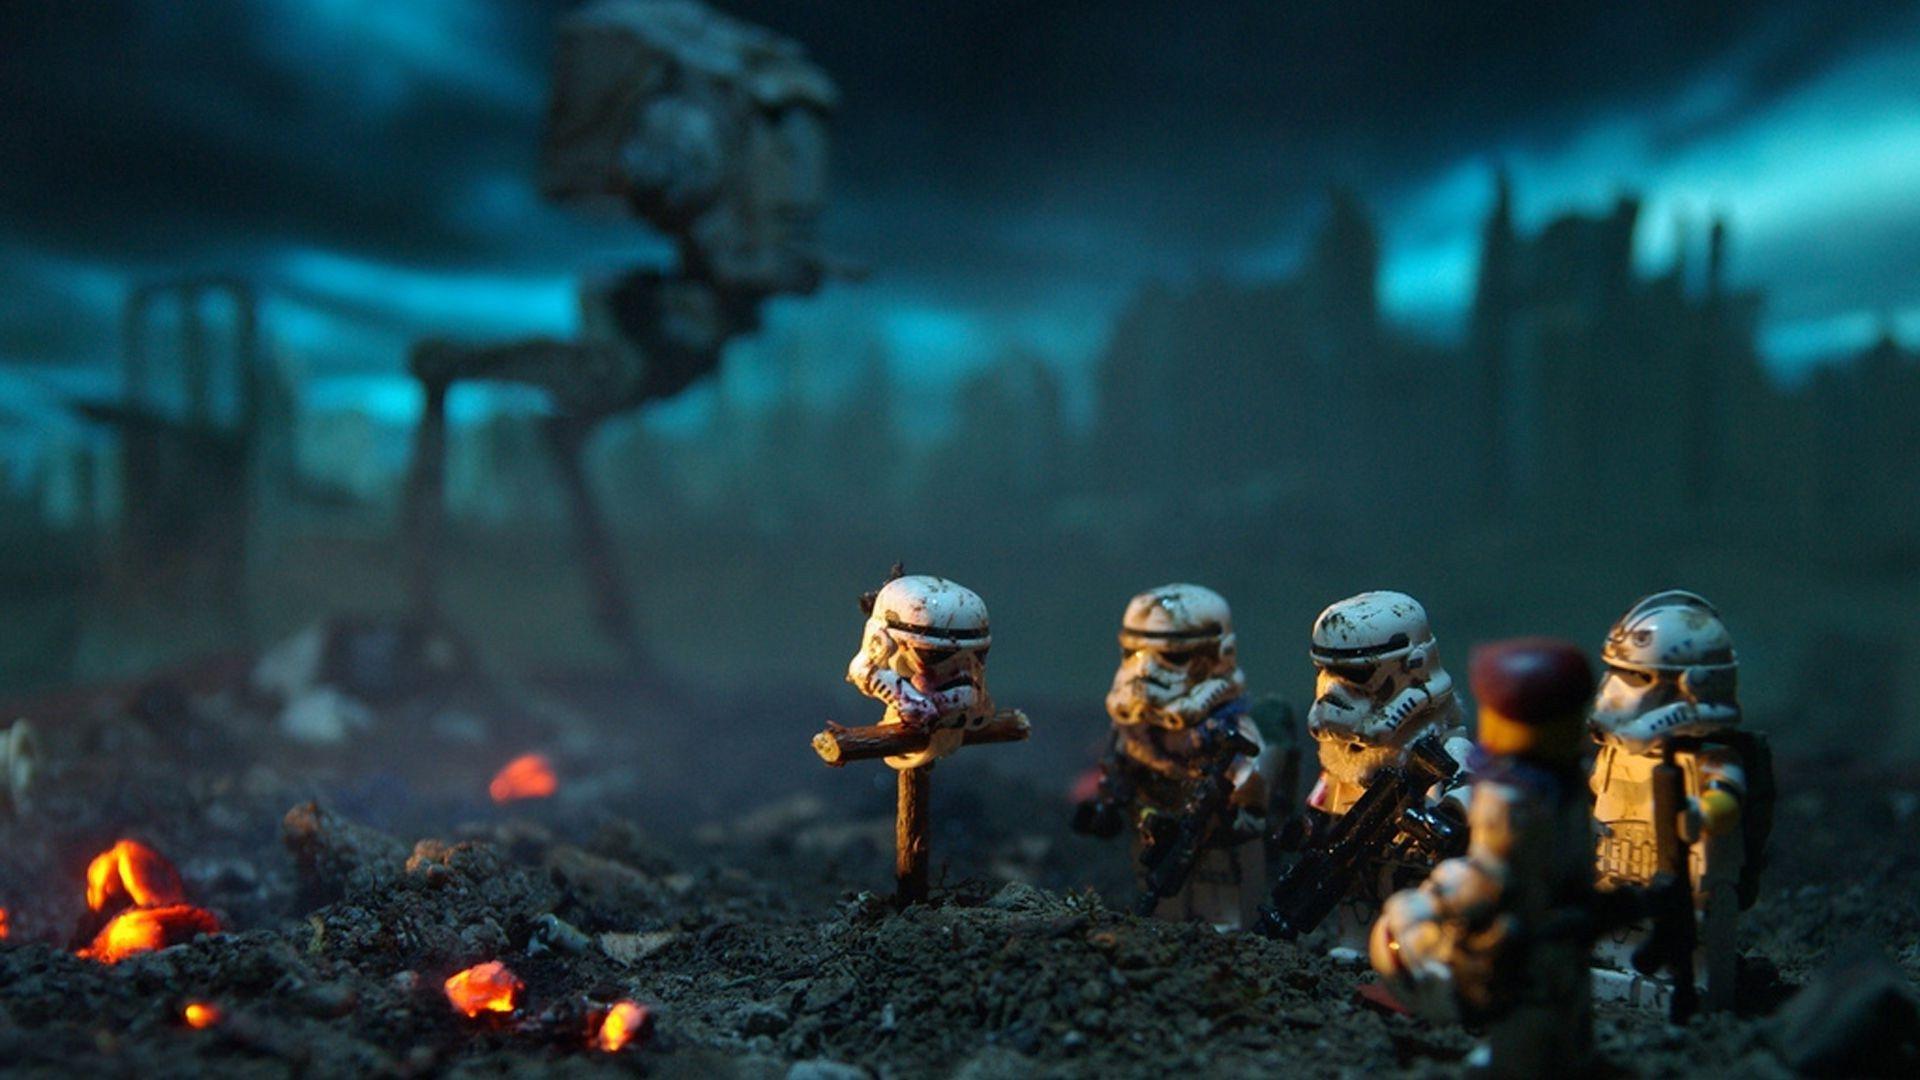 100 Star Wars Wallpaper Hd Backgrounds Images Star Wars